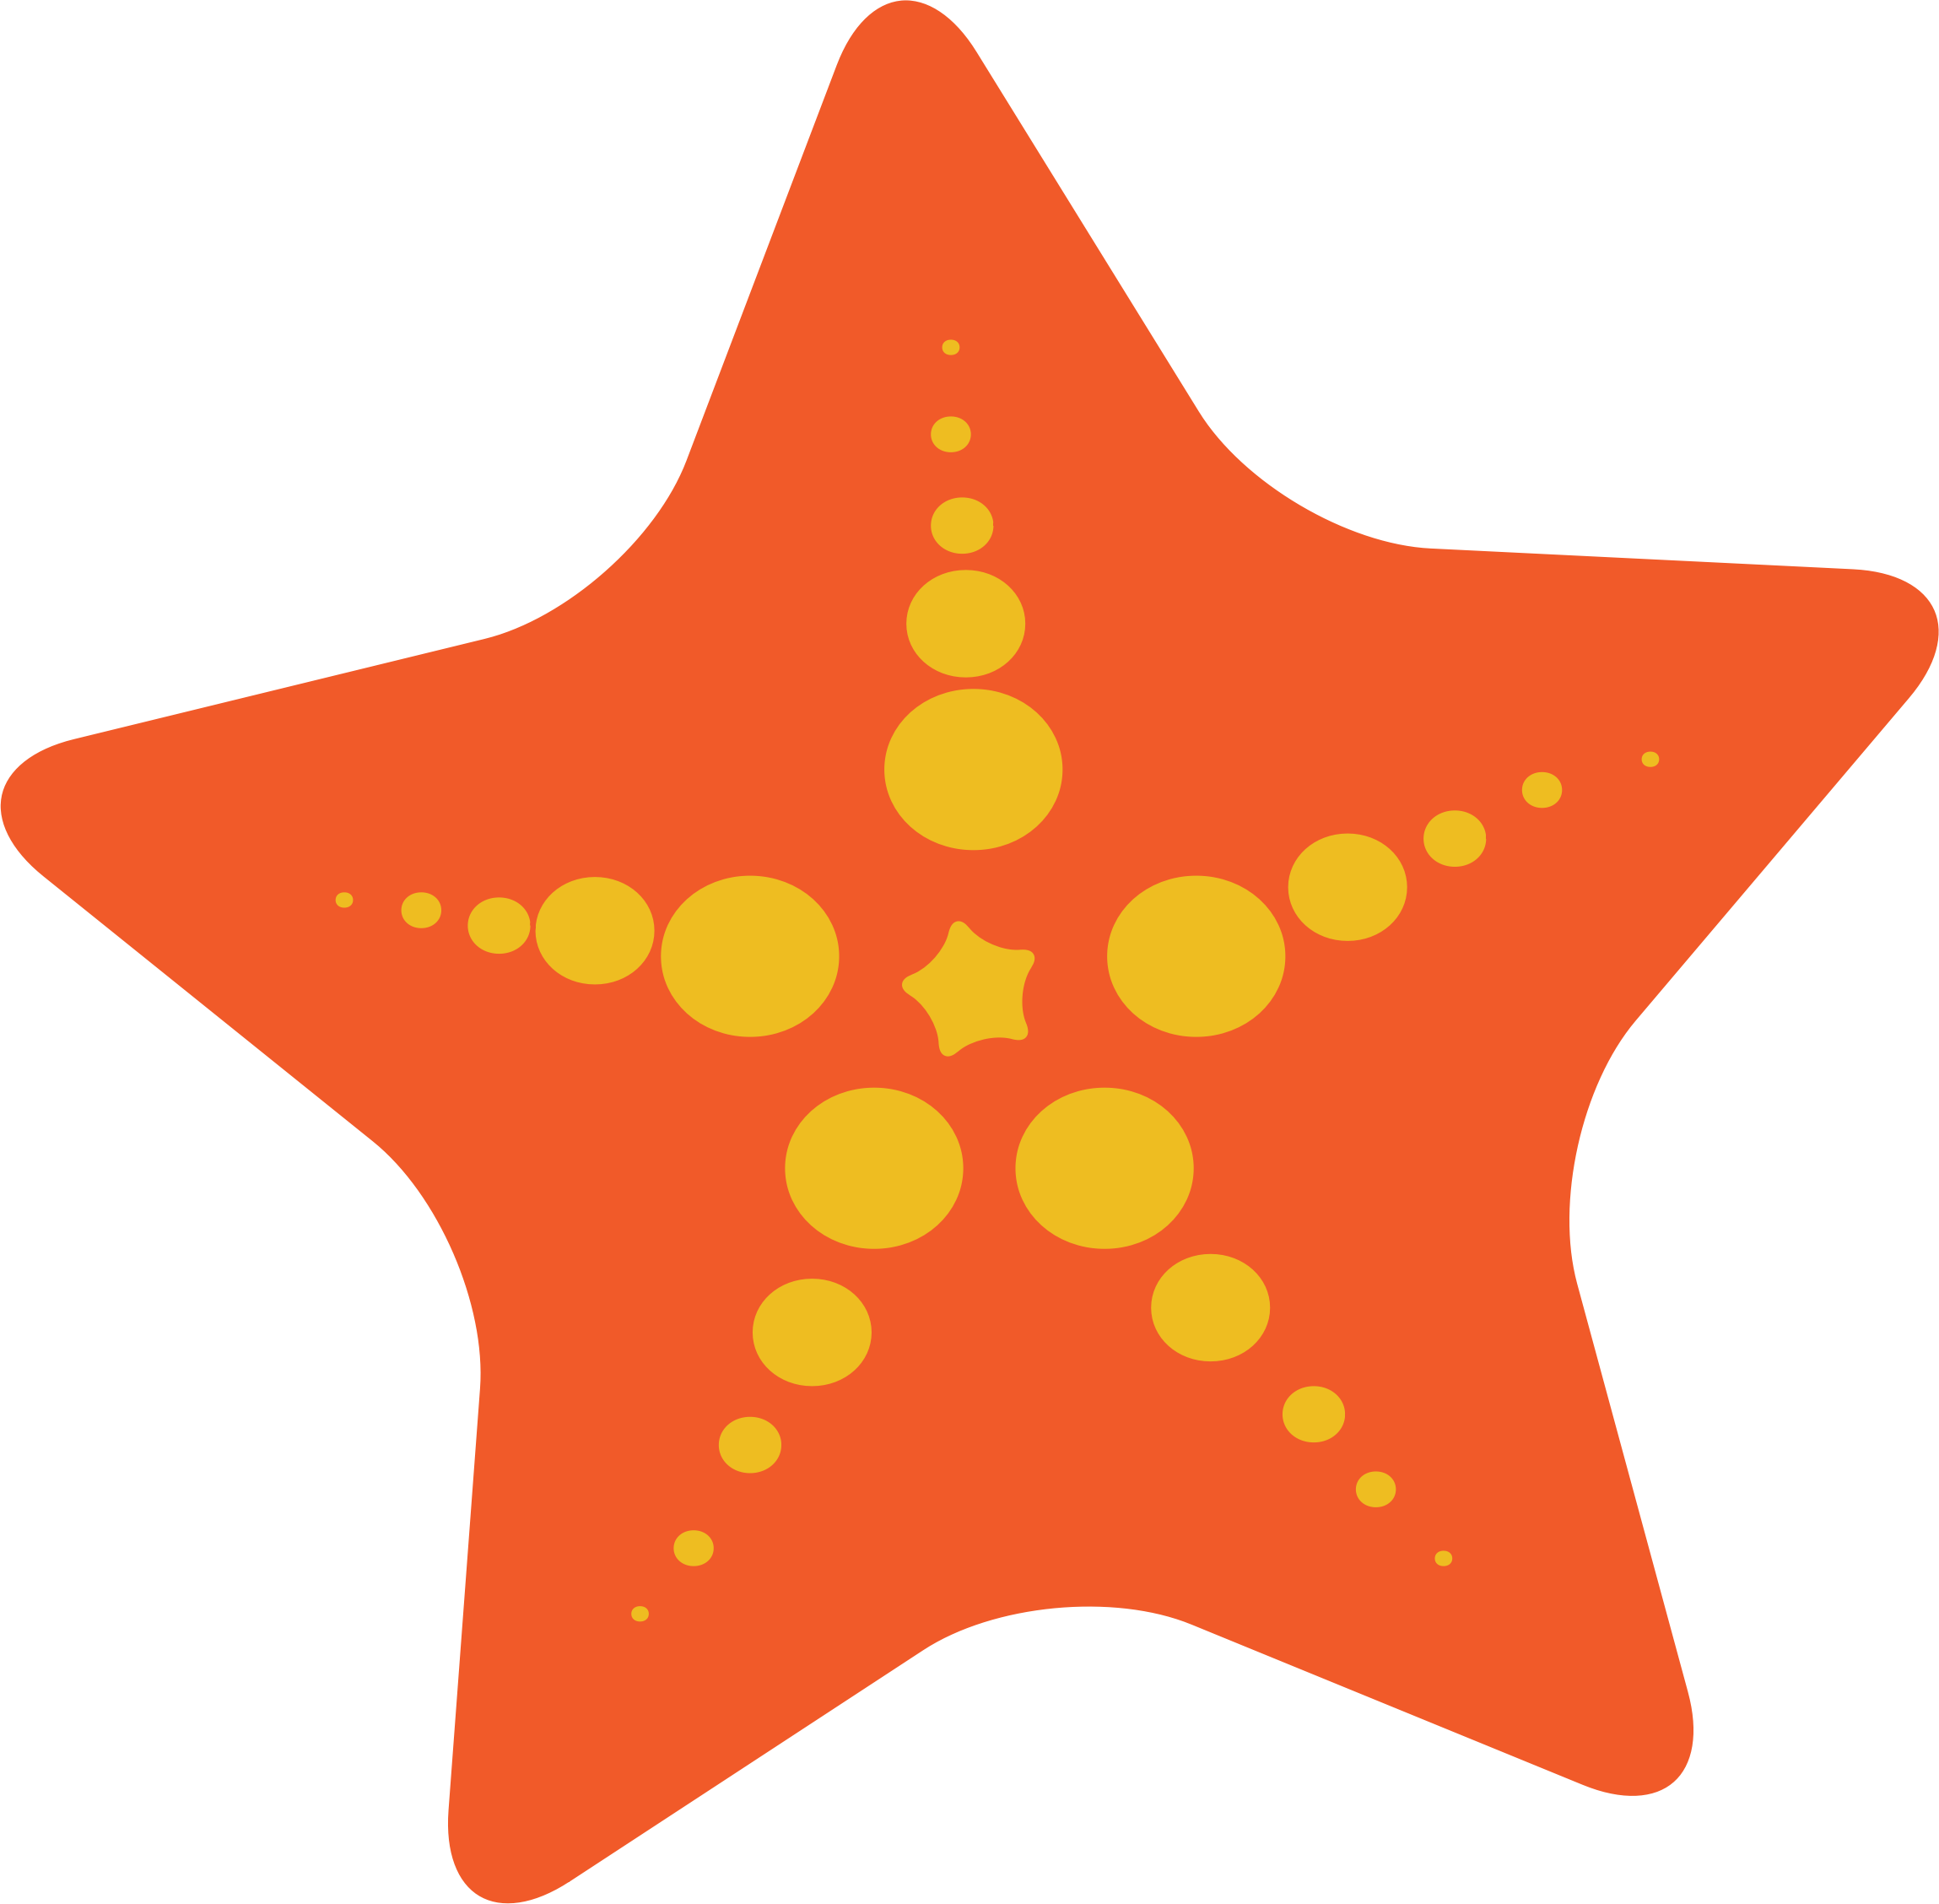 Big image png. Starfish clipart